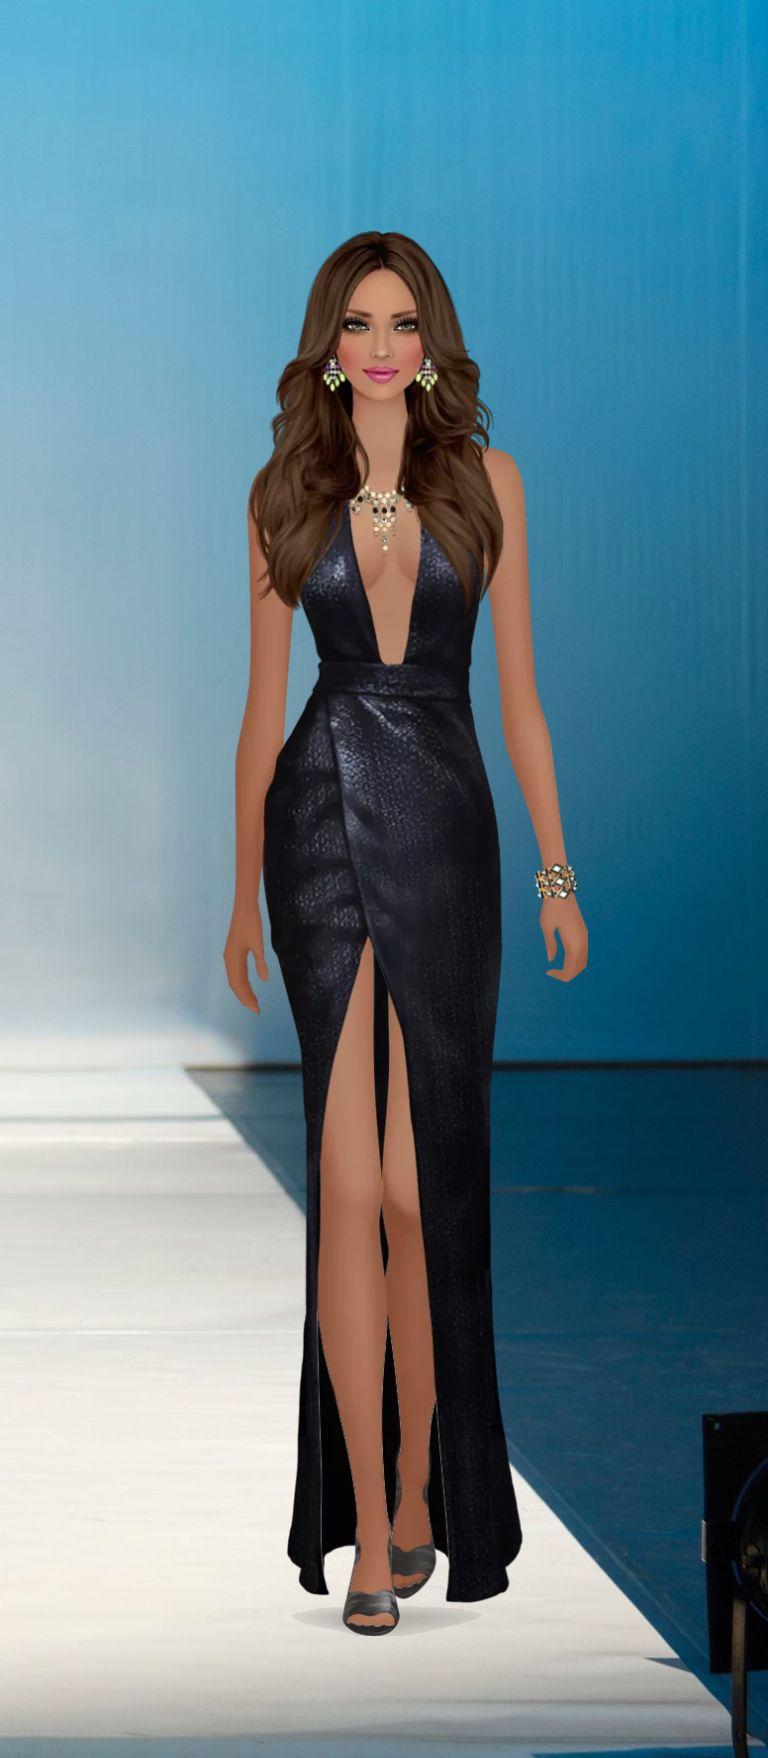 Pin by Crissy Owen on Covet Fashions | Pinterest | Covet fashion ...